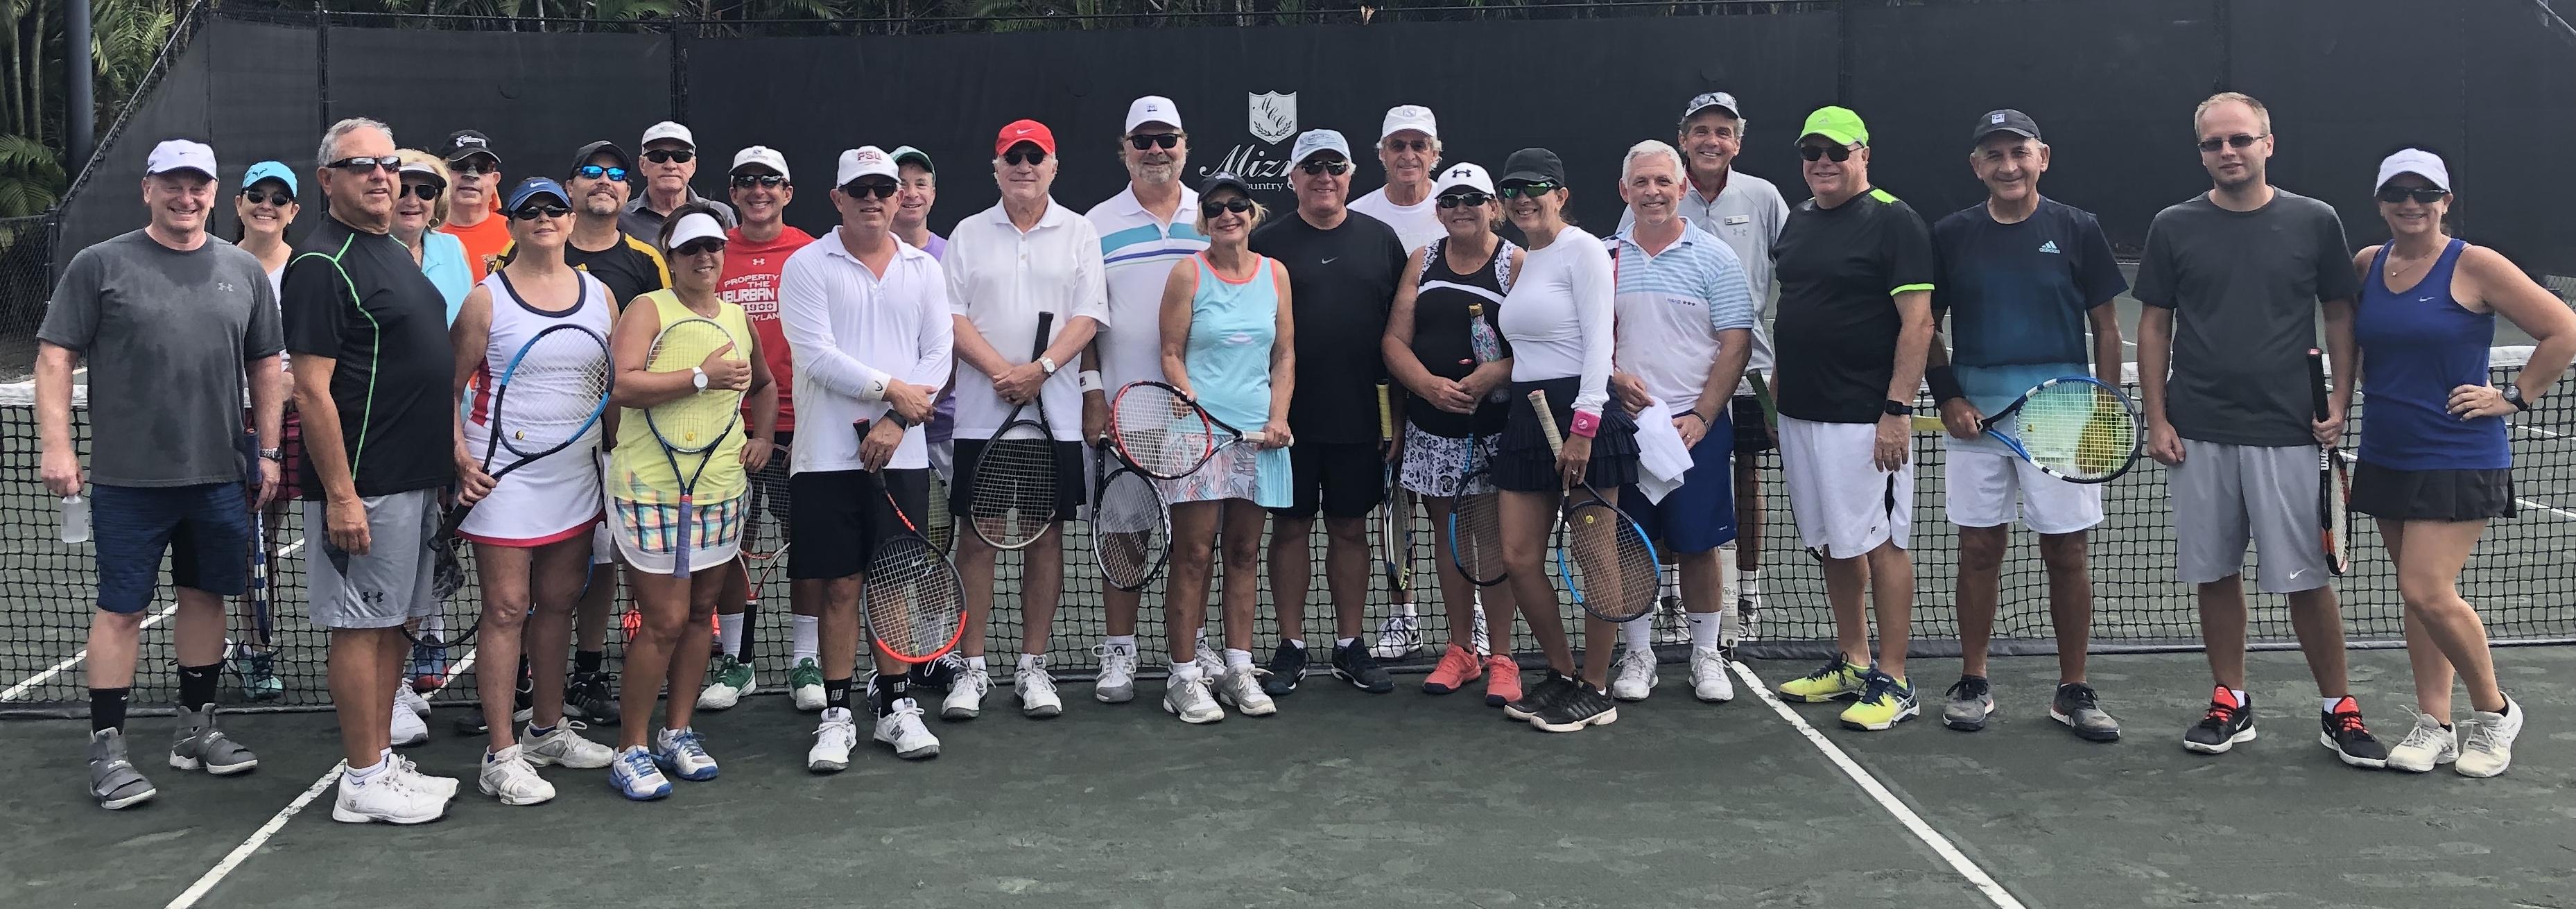 Mizner County Club Tennis